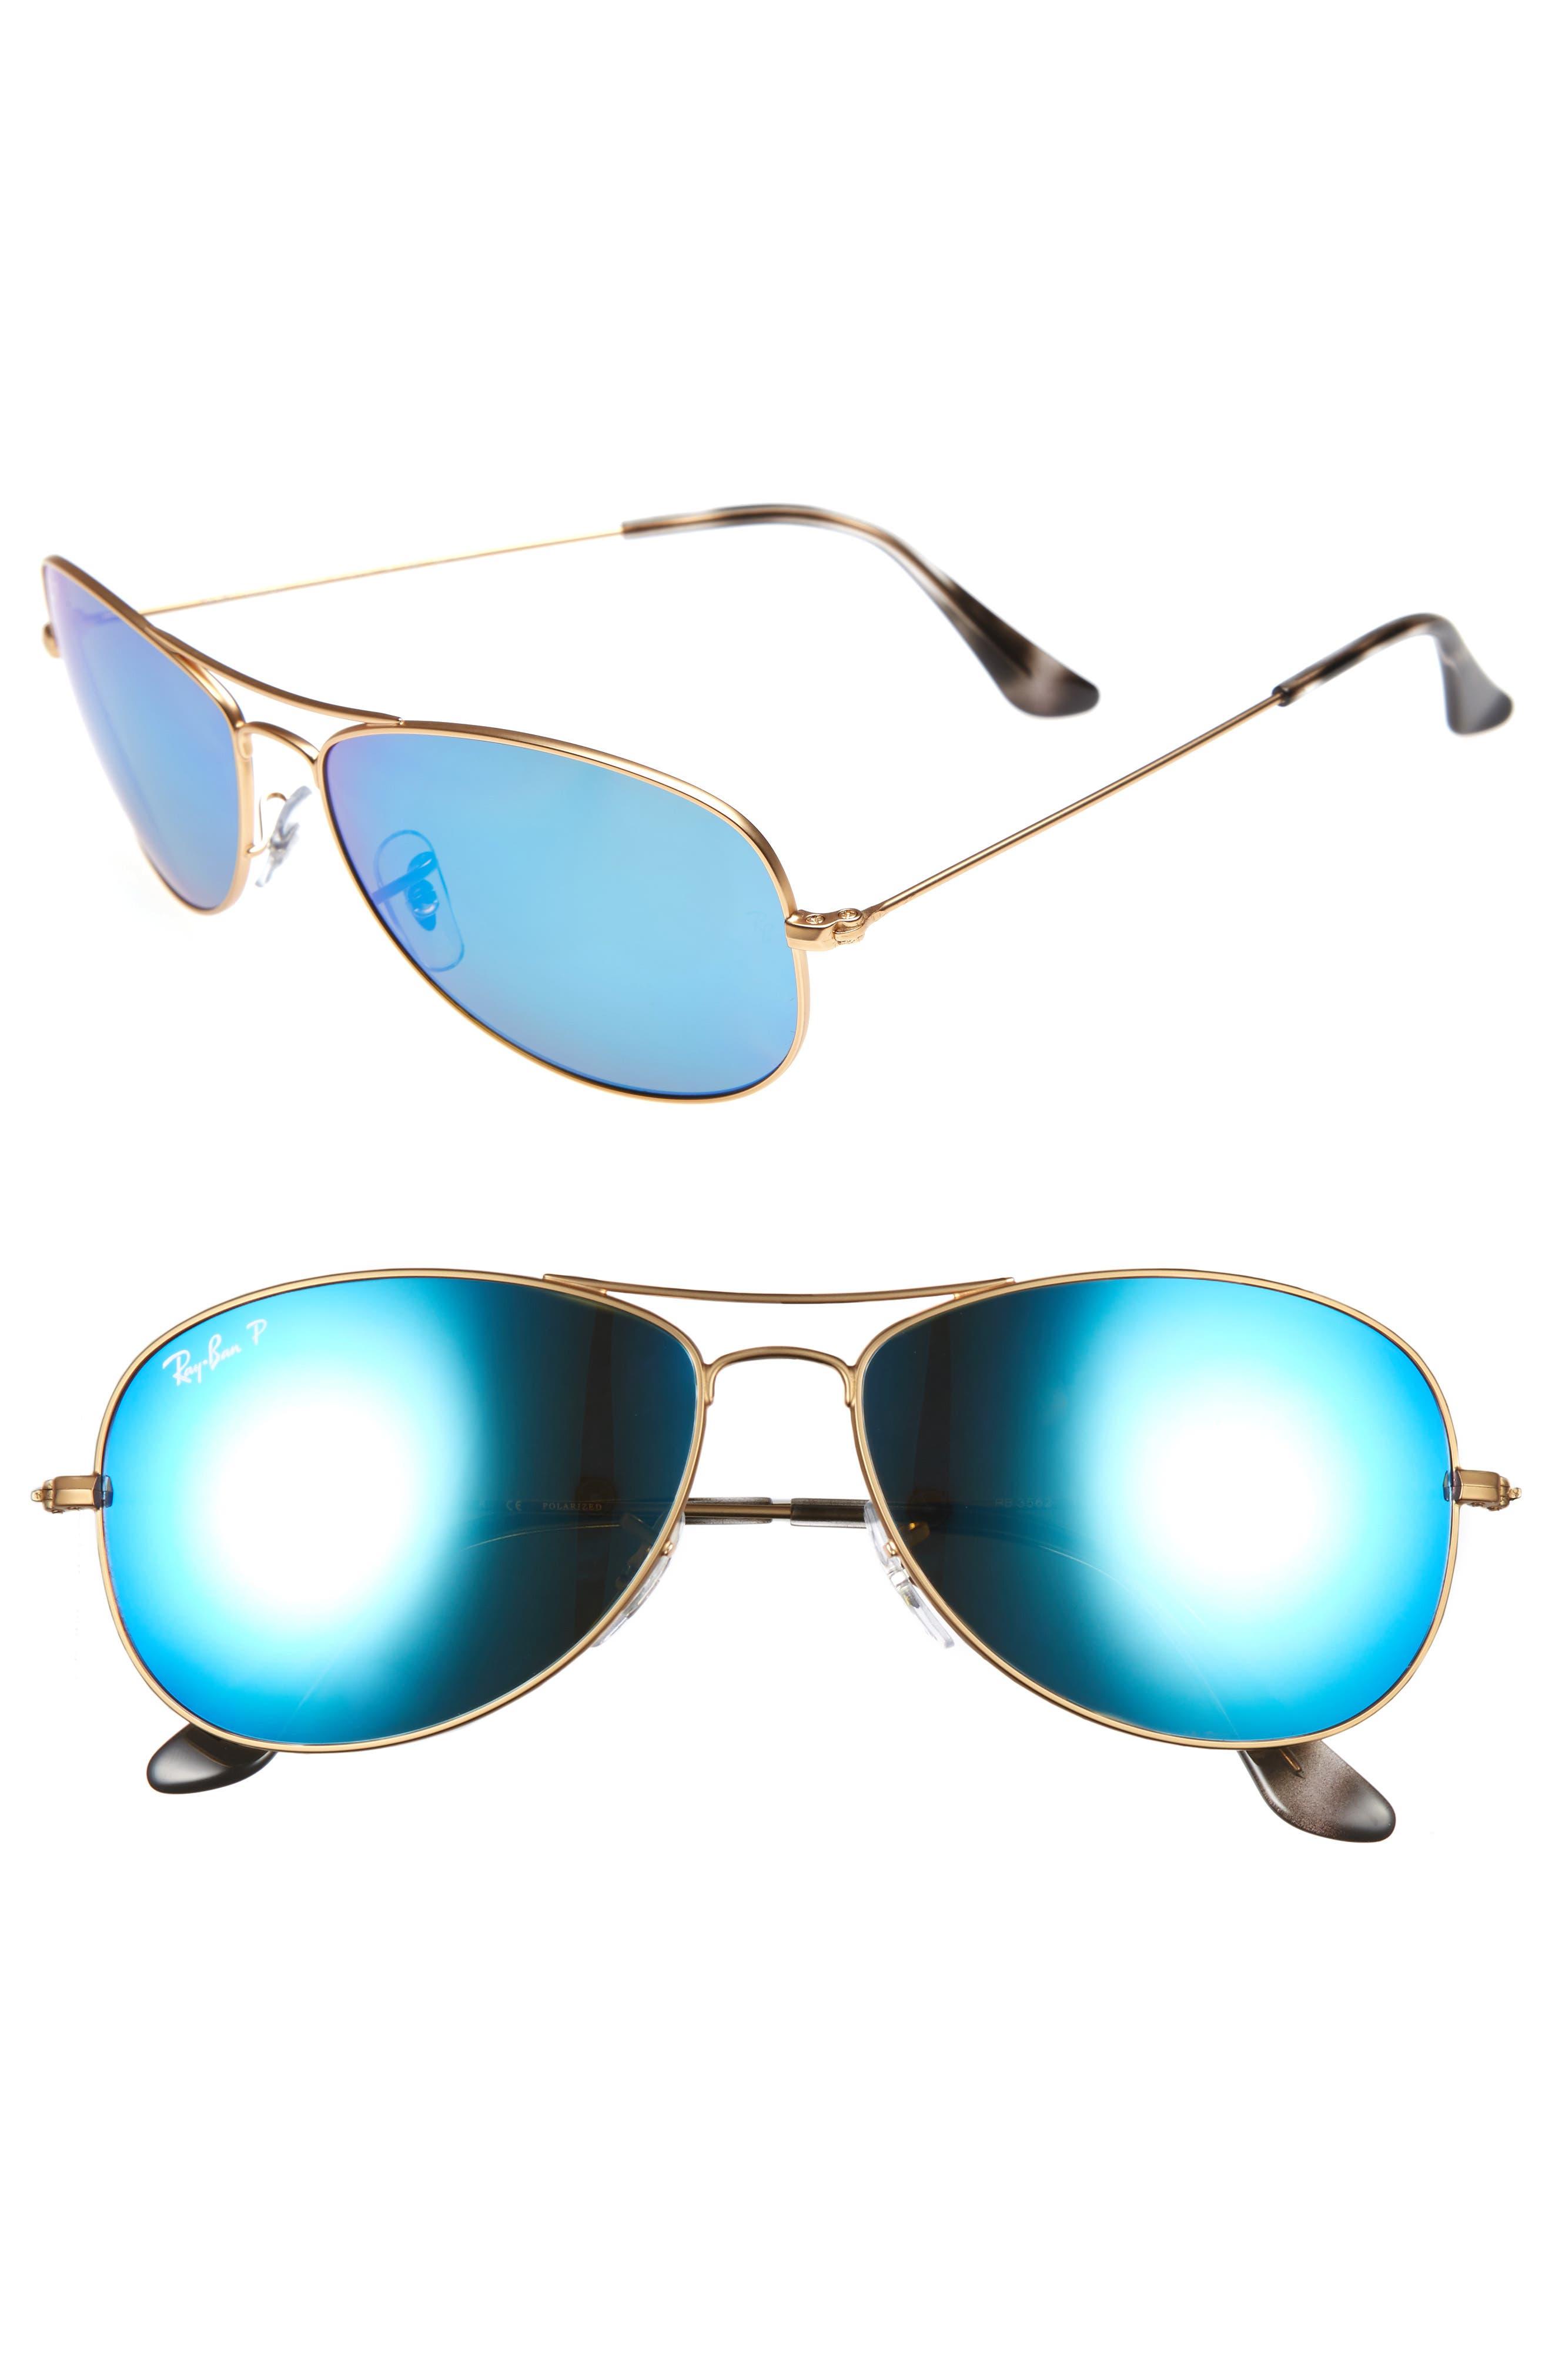 59mm Chromance Aviator Sunglasses,                         Main,                         color, GOLD/ BLUE GREEN